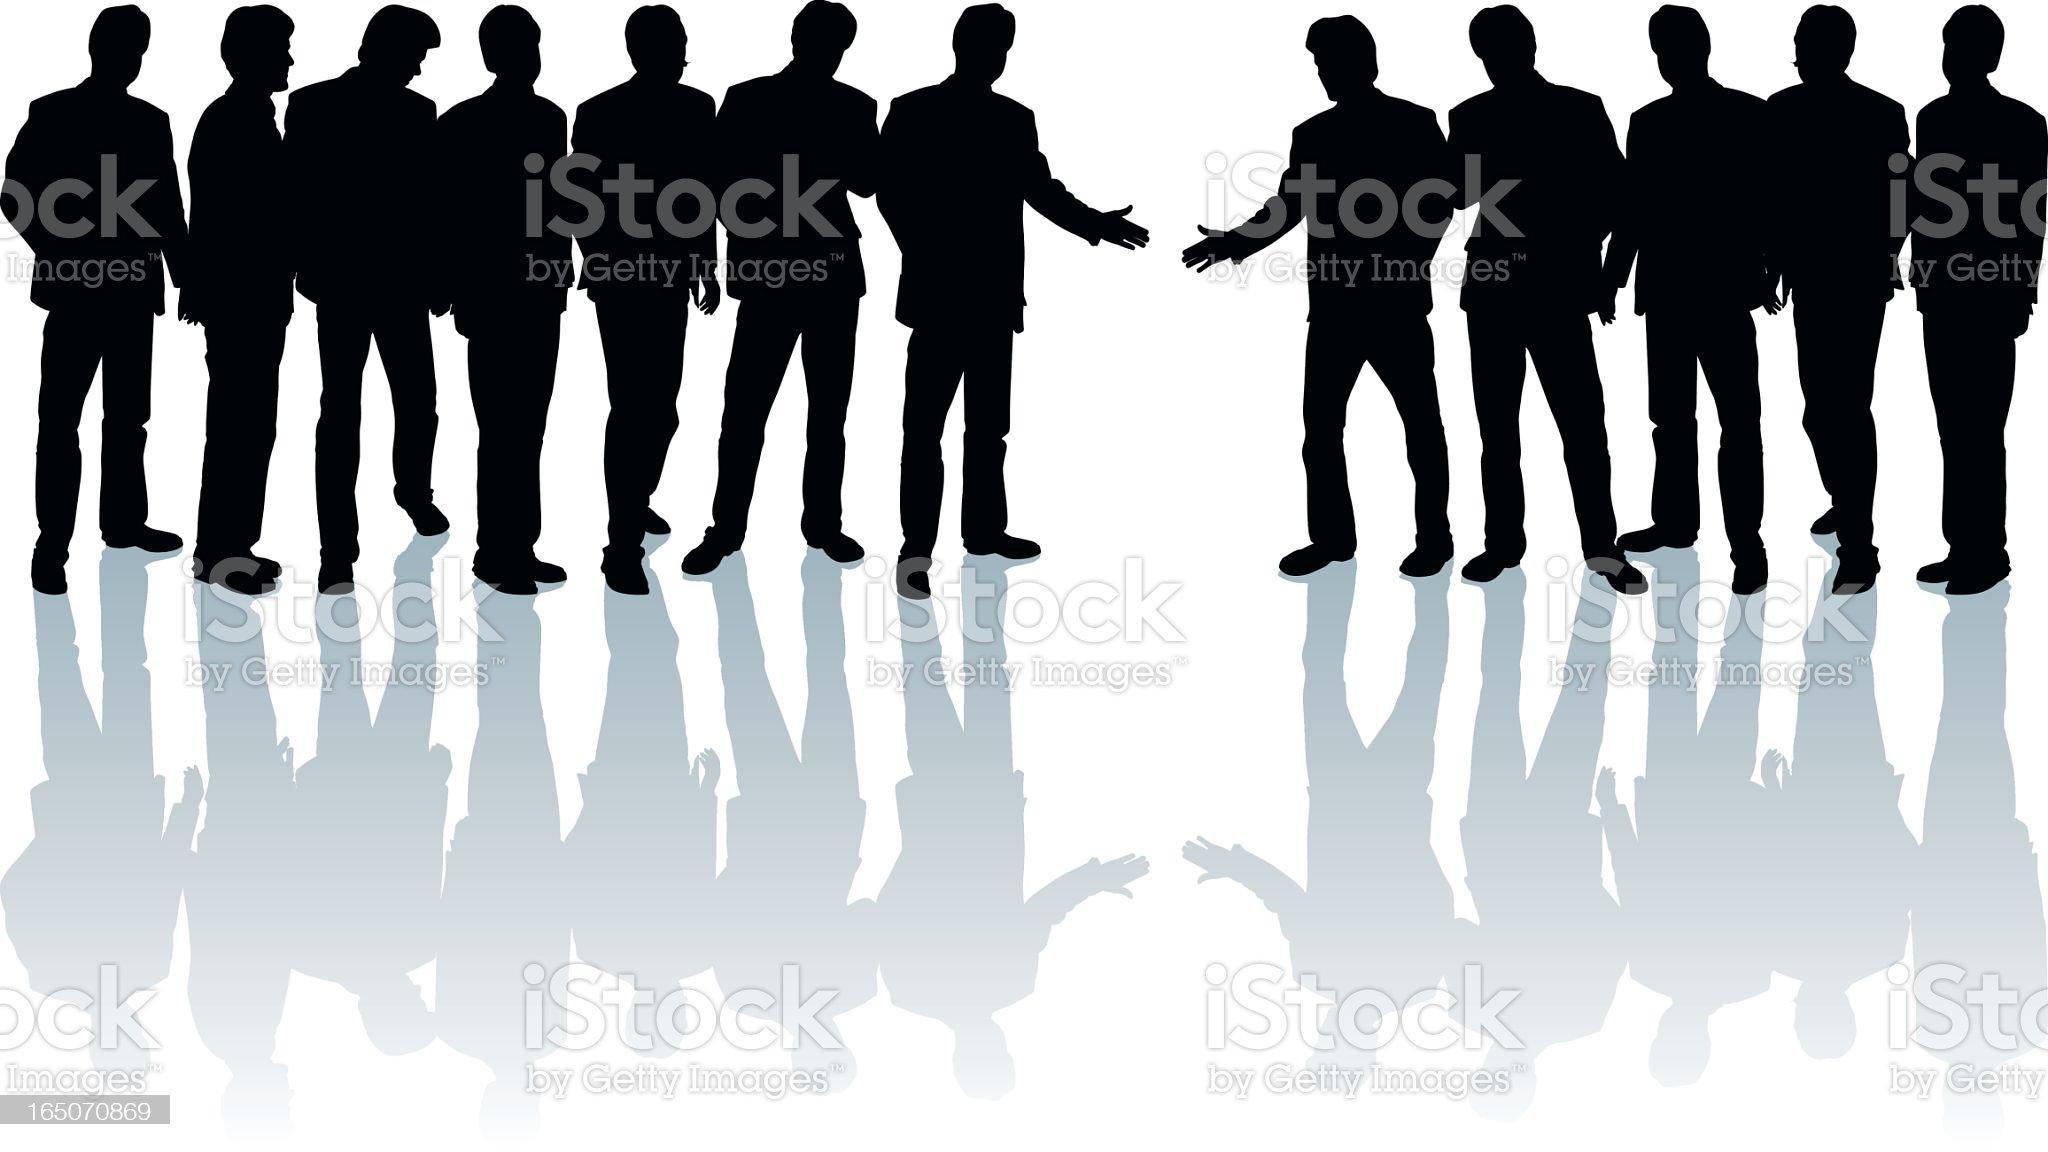 Shake hands (group) royalty-free stock vector art